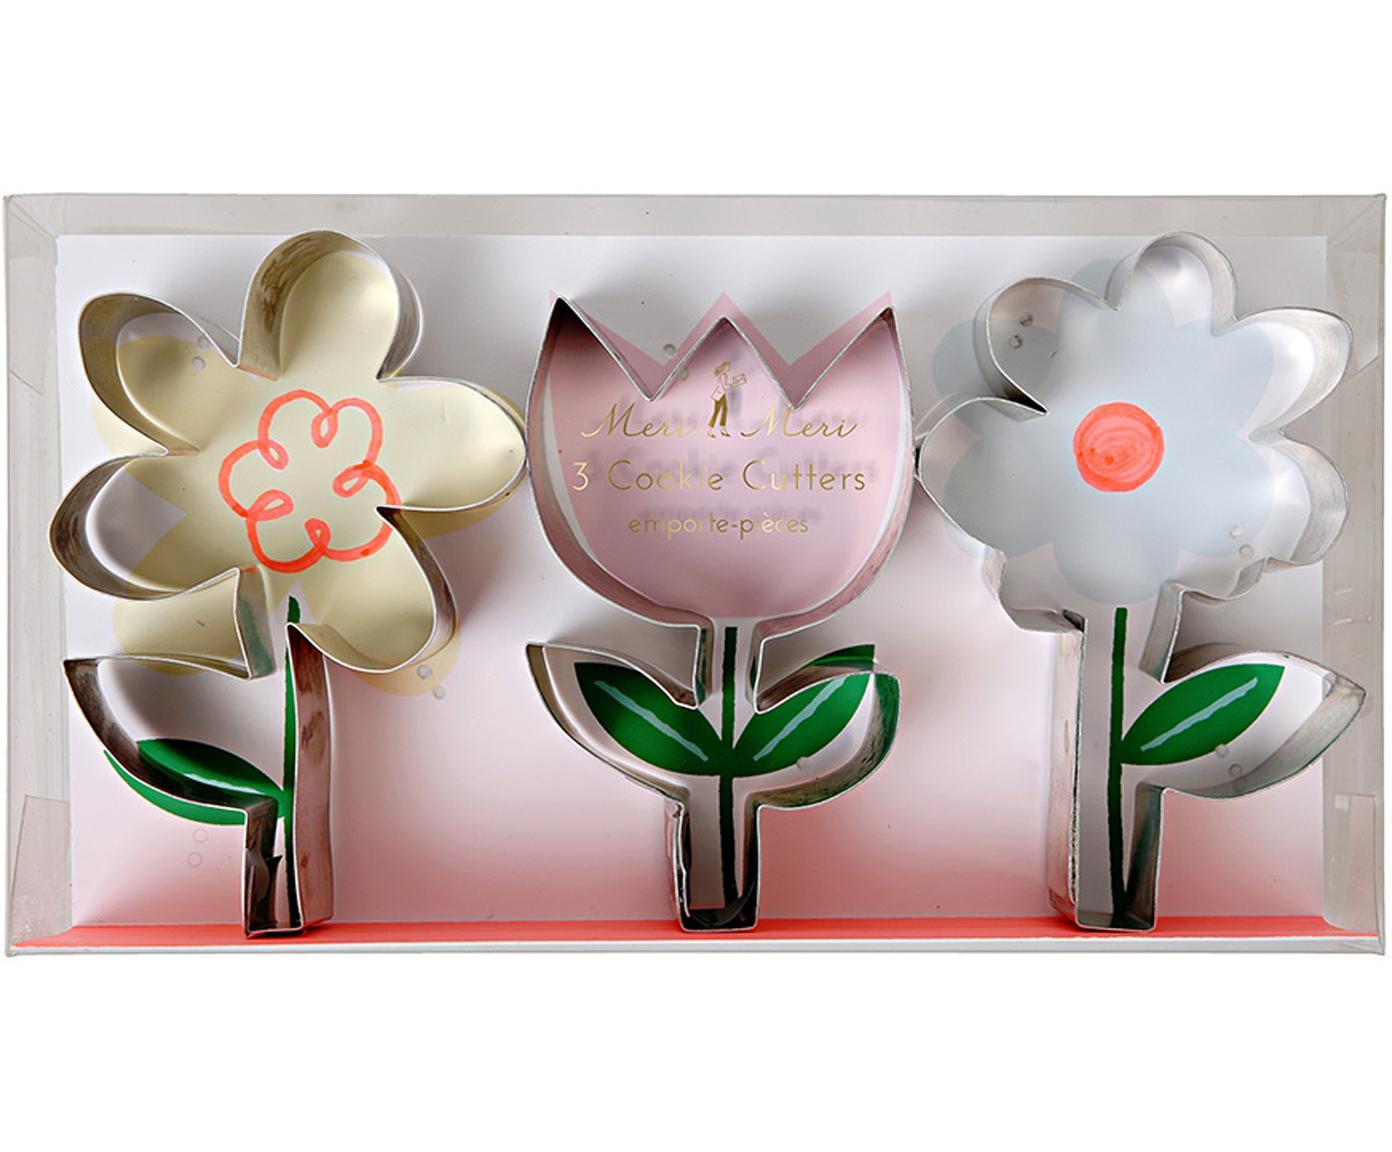 Set formine per biscotti Flower, 3 pz., Acciaio inossidabile, Acciaio inossidabile, Larg. 19 x Alt. 11 cm